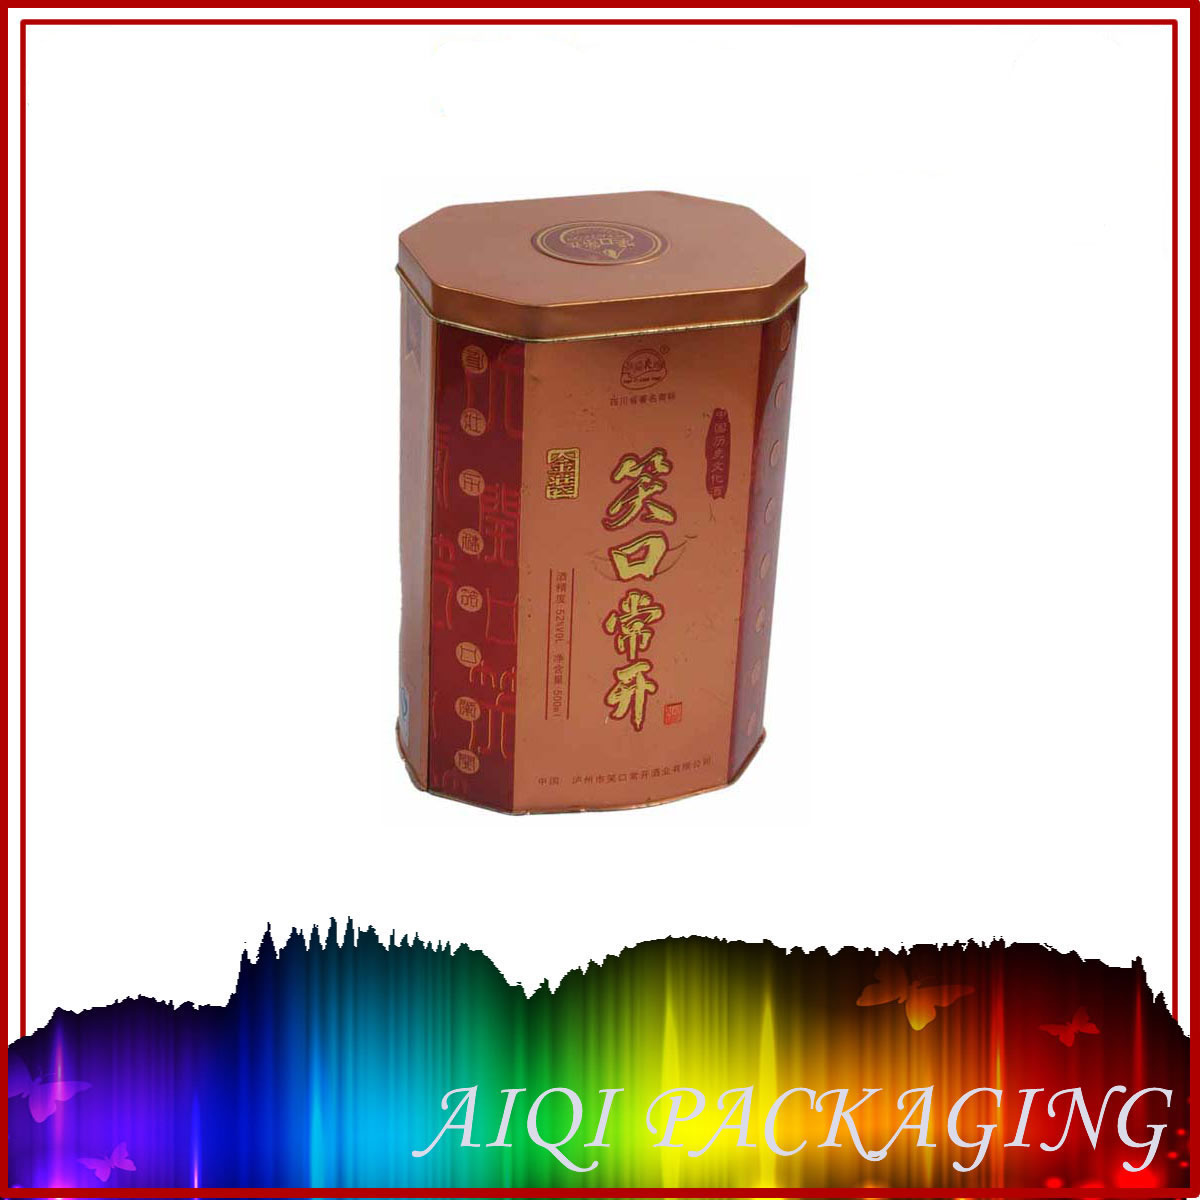 Whiskey box for wedding